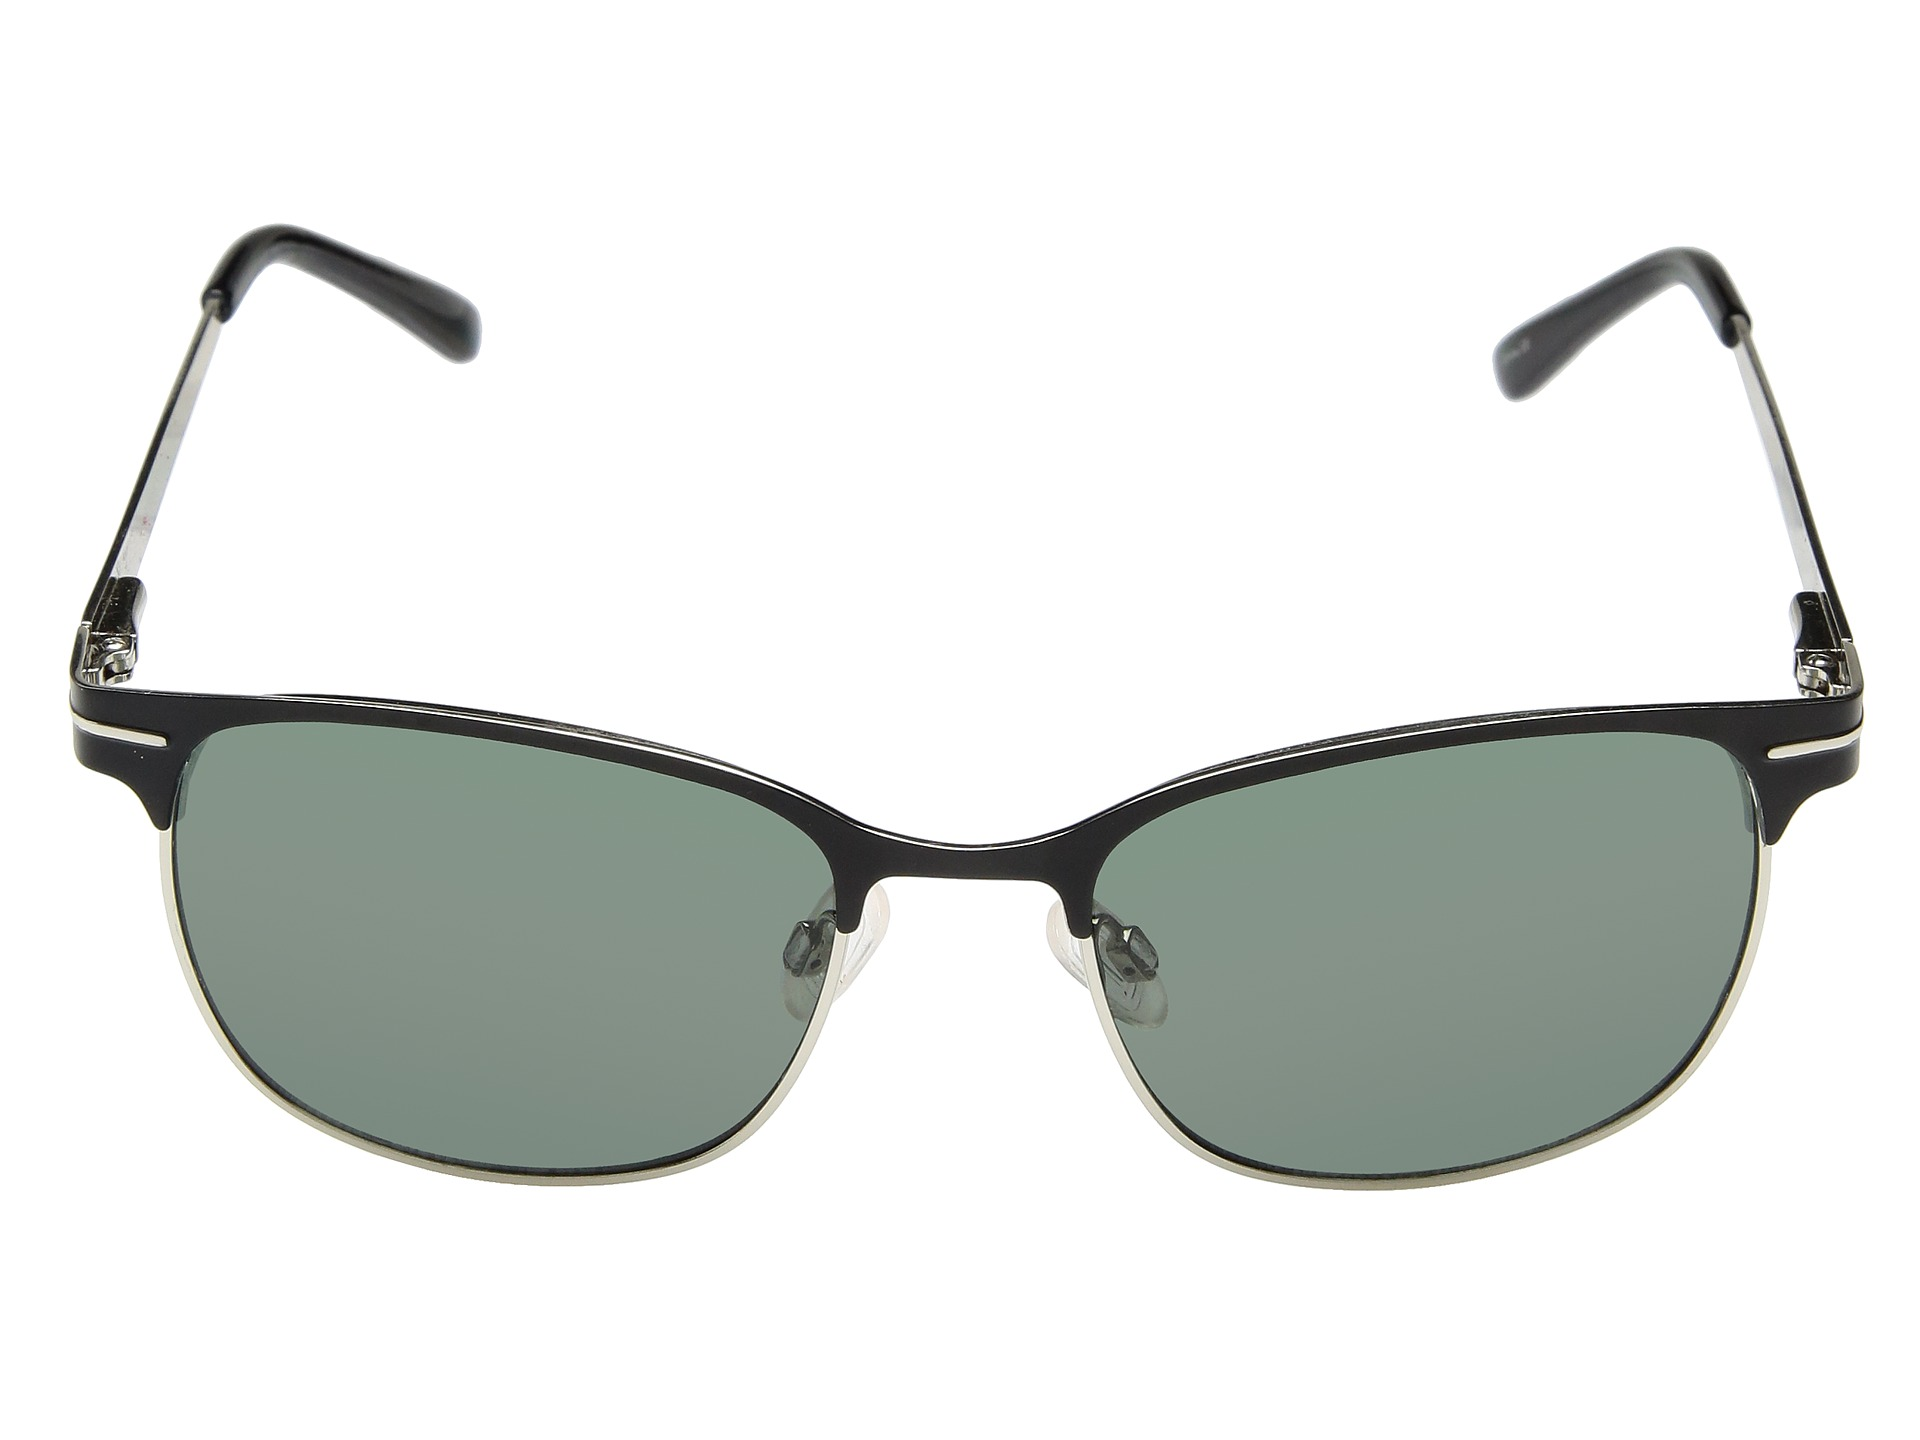 e77d8a8bff69 Red Star Polarized Sunglasses. Jun20. Elderly friends. Suncloud Star  Polarized Sunglasses Review